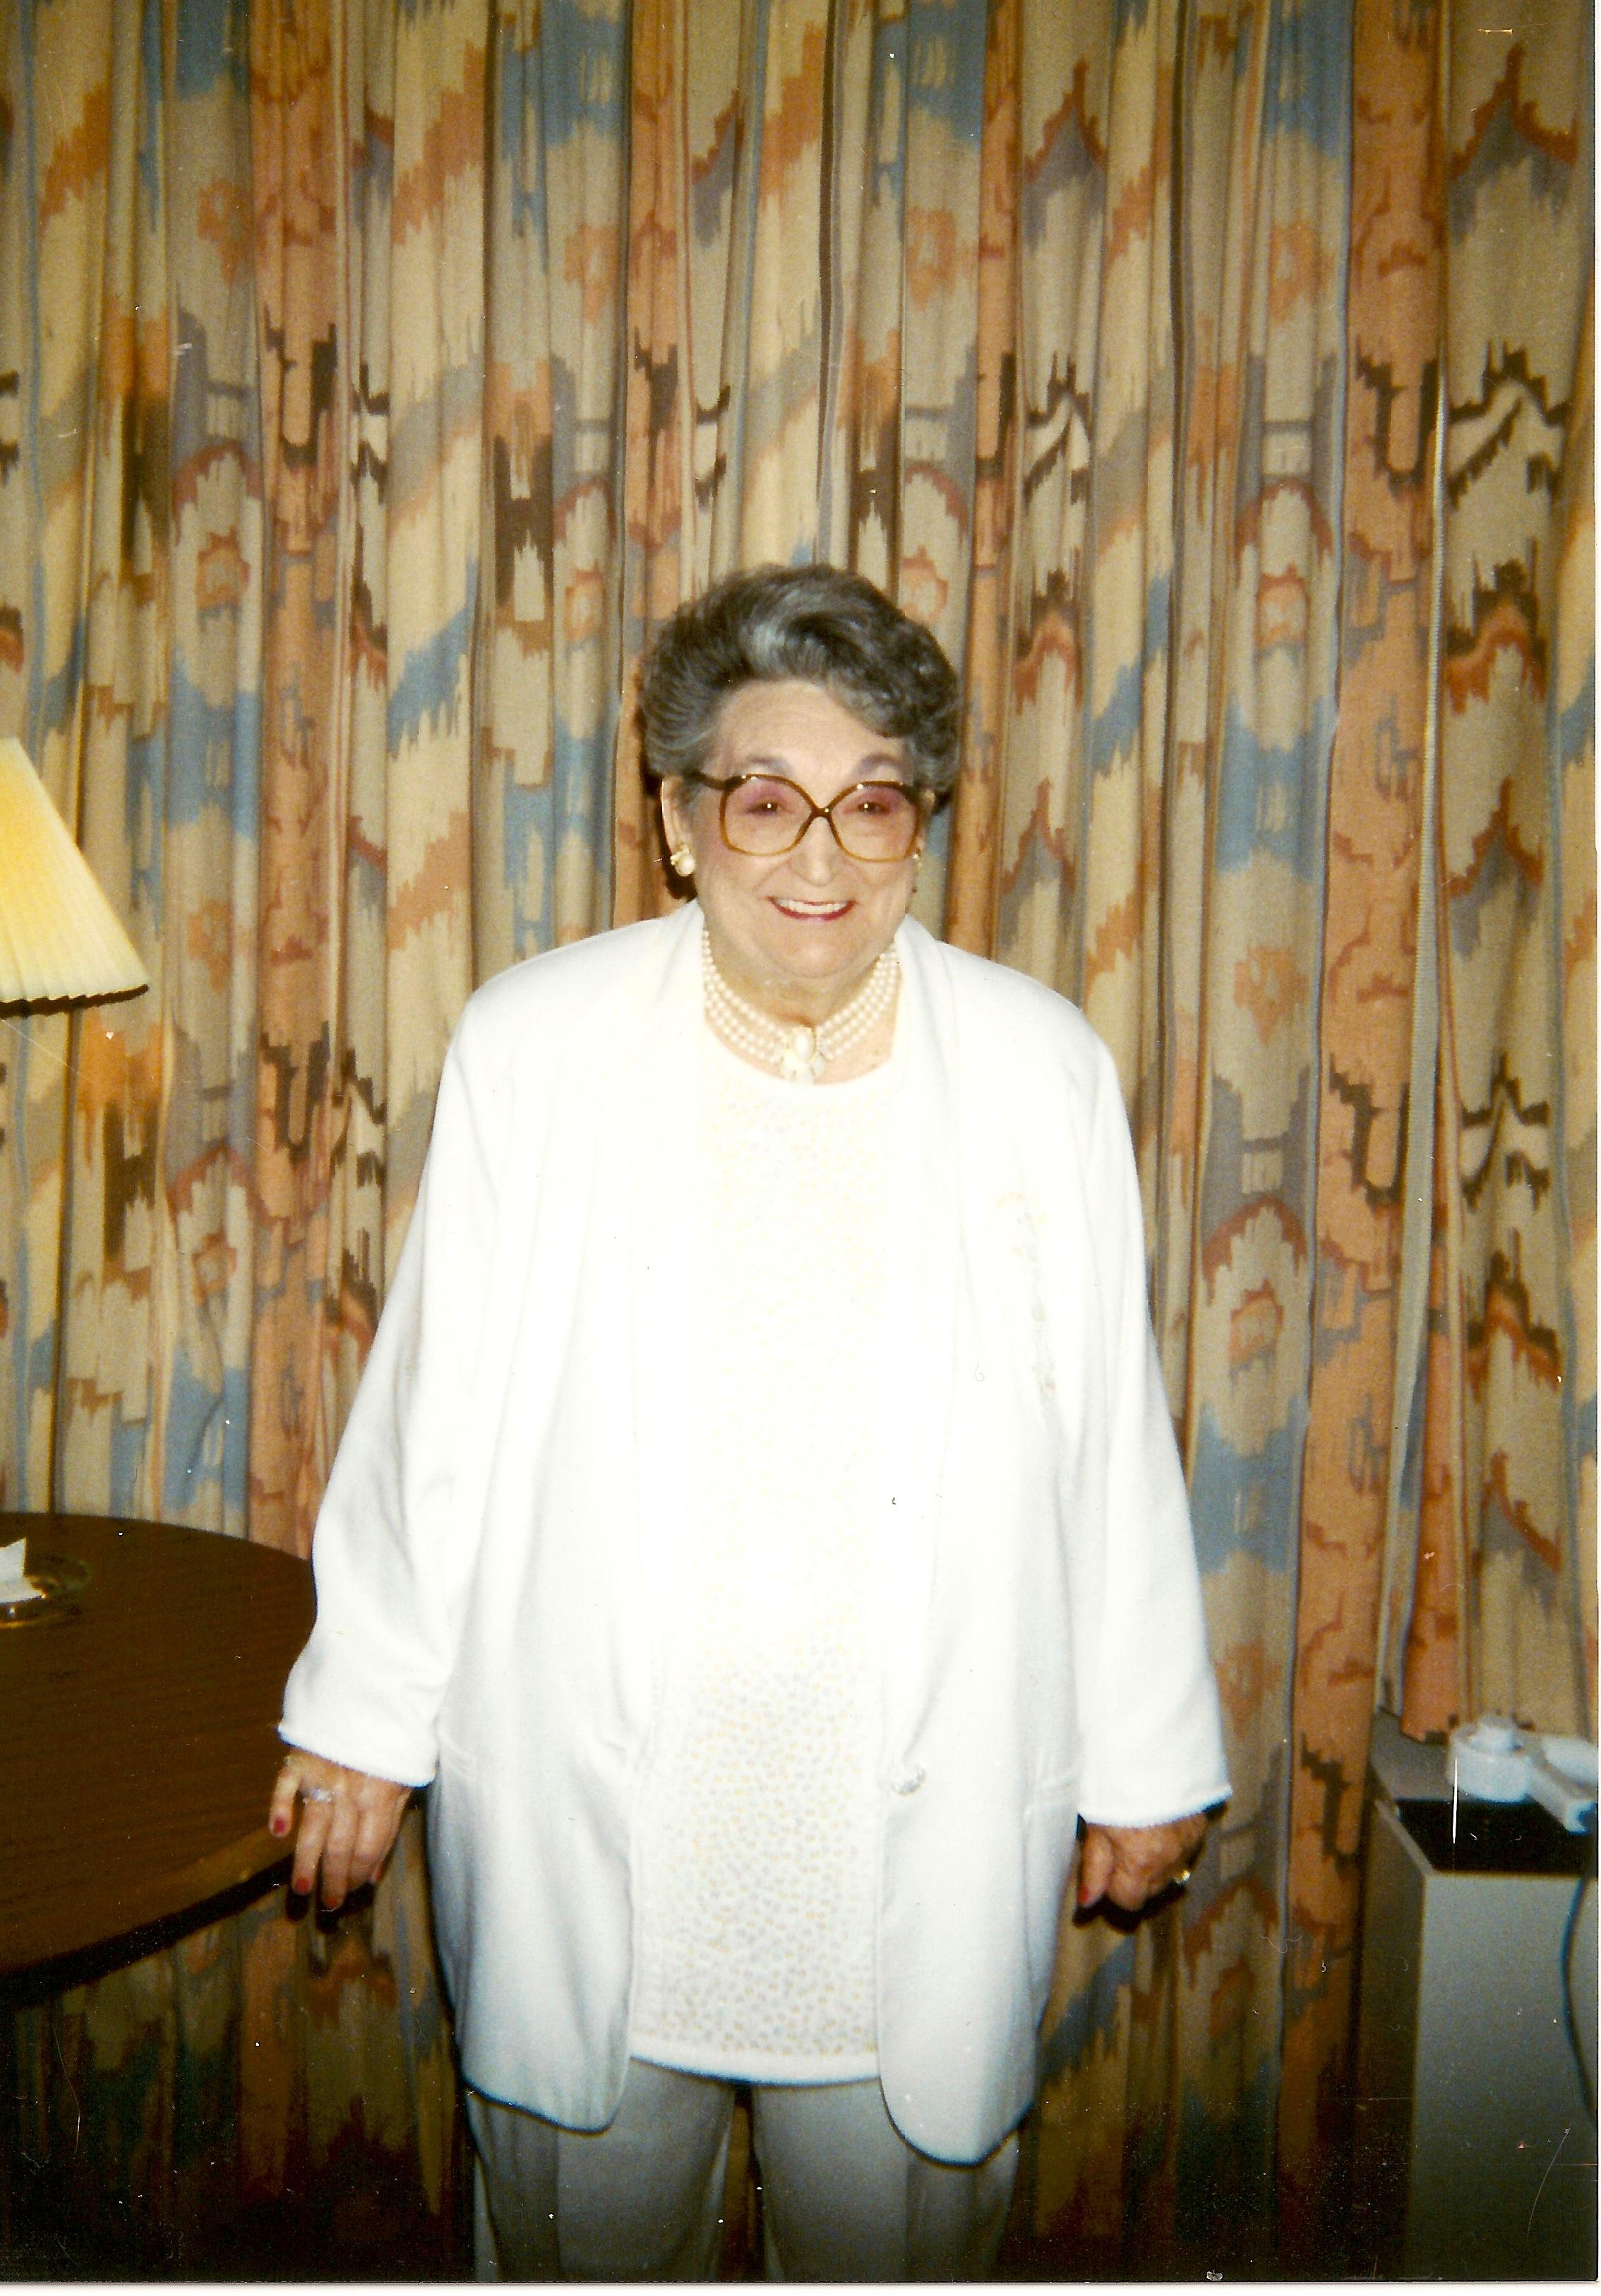 Mother, Grandmother, Great-grandmother, & Aunt Dorothy Evelyn Chisholm Proctor